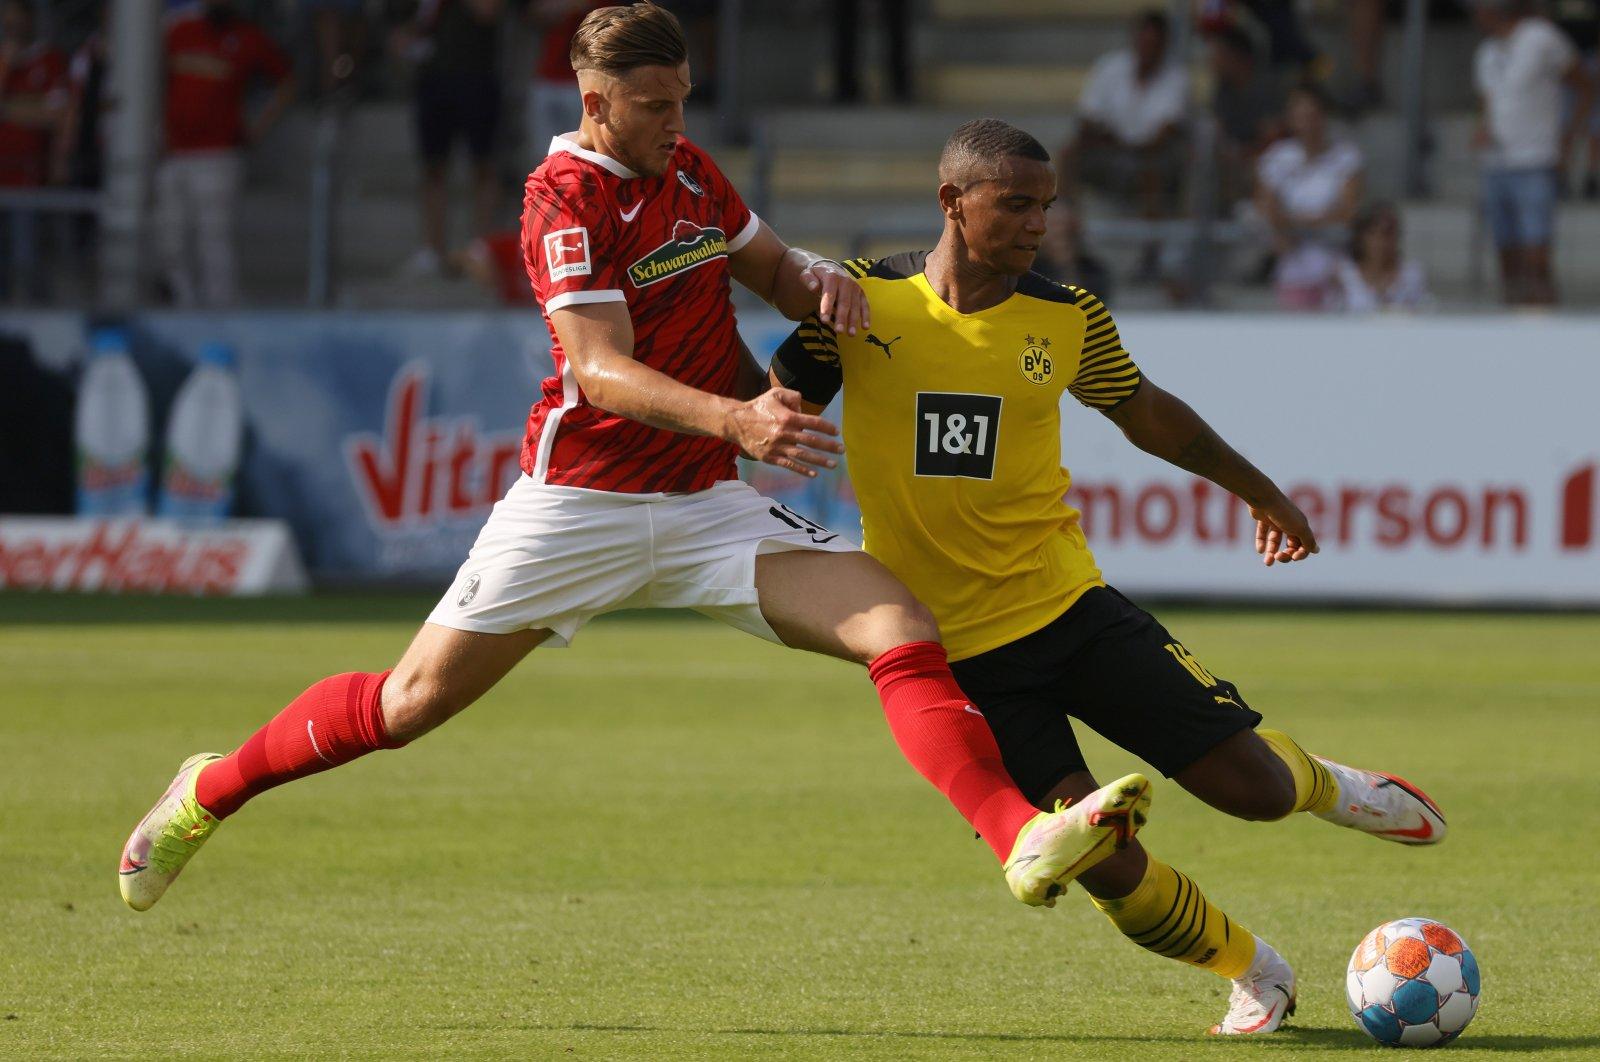 Freiburg's Ermedin Demirovic (L) in action against Dortmund's Manuel Akanji (R) during a German Bundesliga match in Freiburg, Germany, Aug. 21, 2021. (EPA Photo)